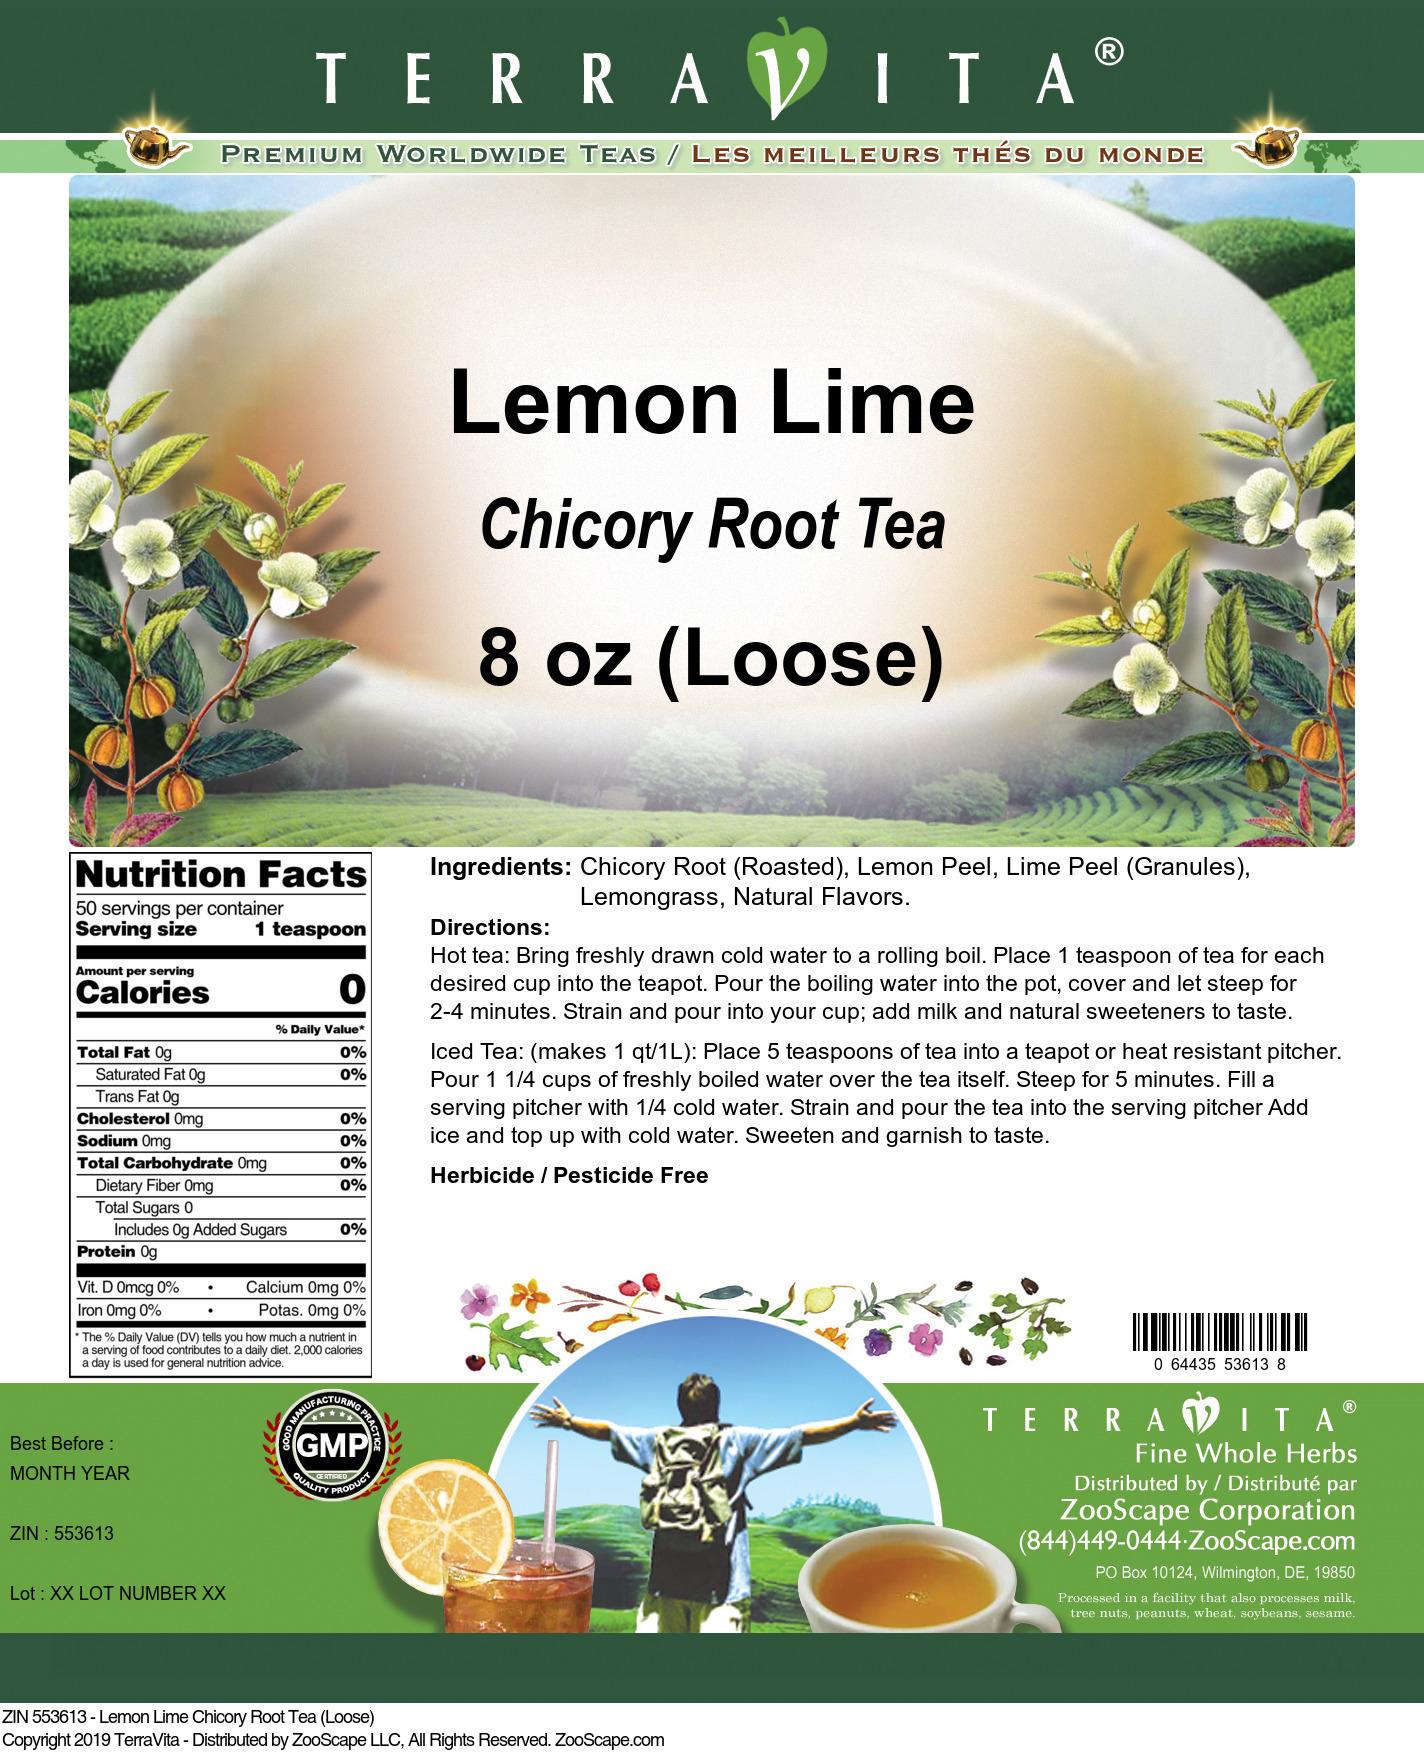 Lemon Lime Chicory Root